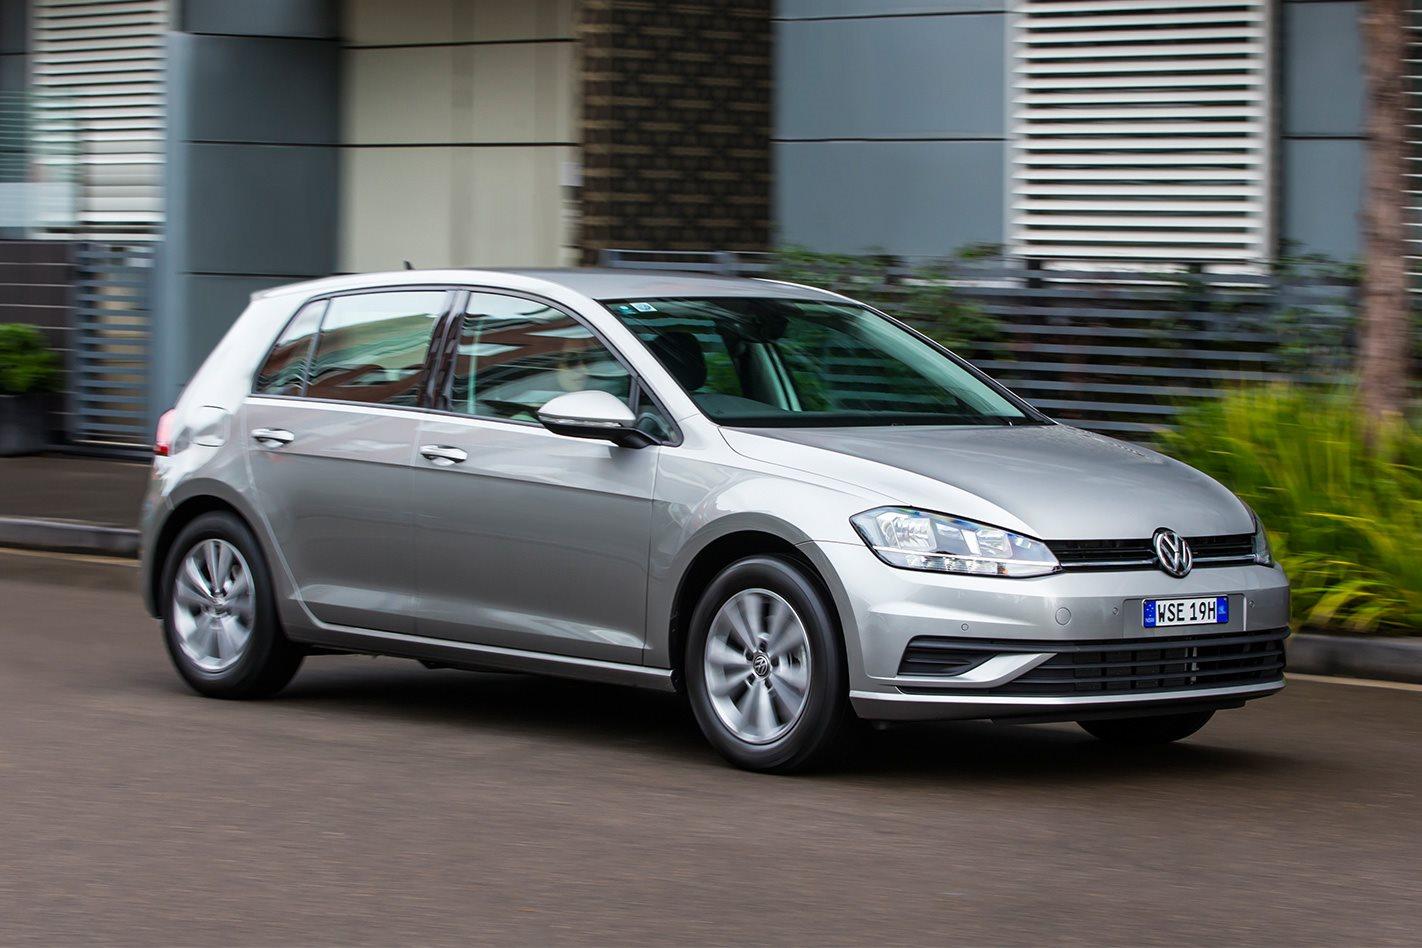 ed47b47cdc0c 2018 Volkswagen Golf 110TSI Comfortline review